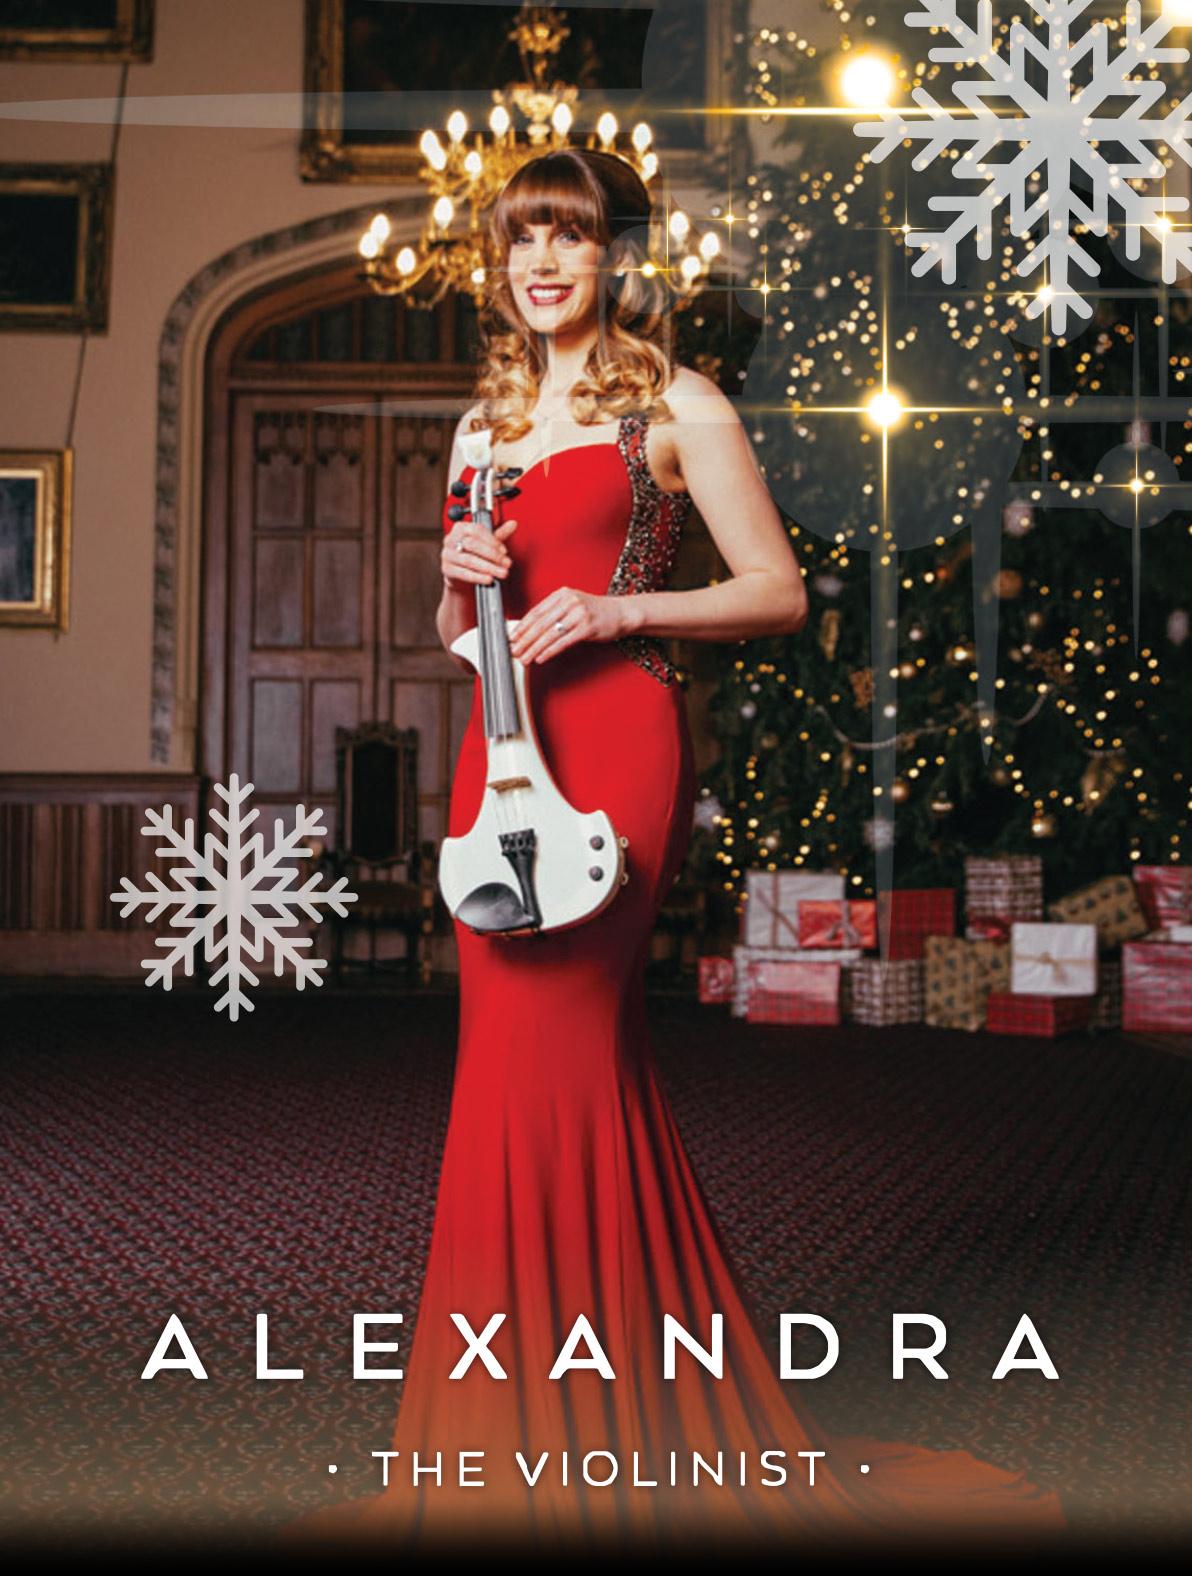 Alexandra - The violinist